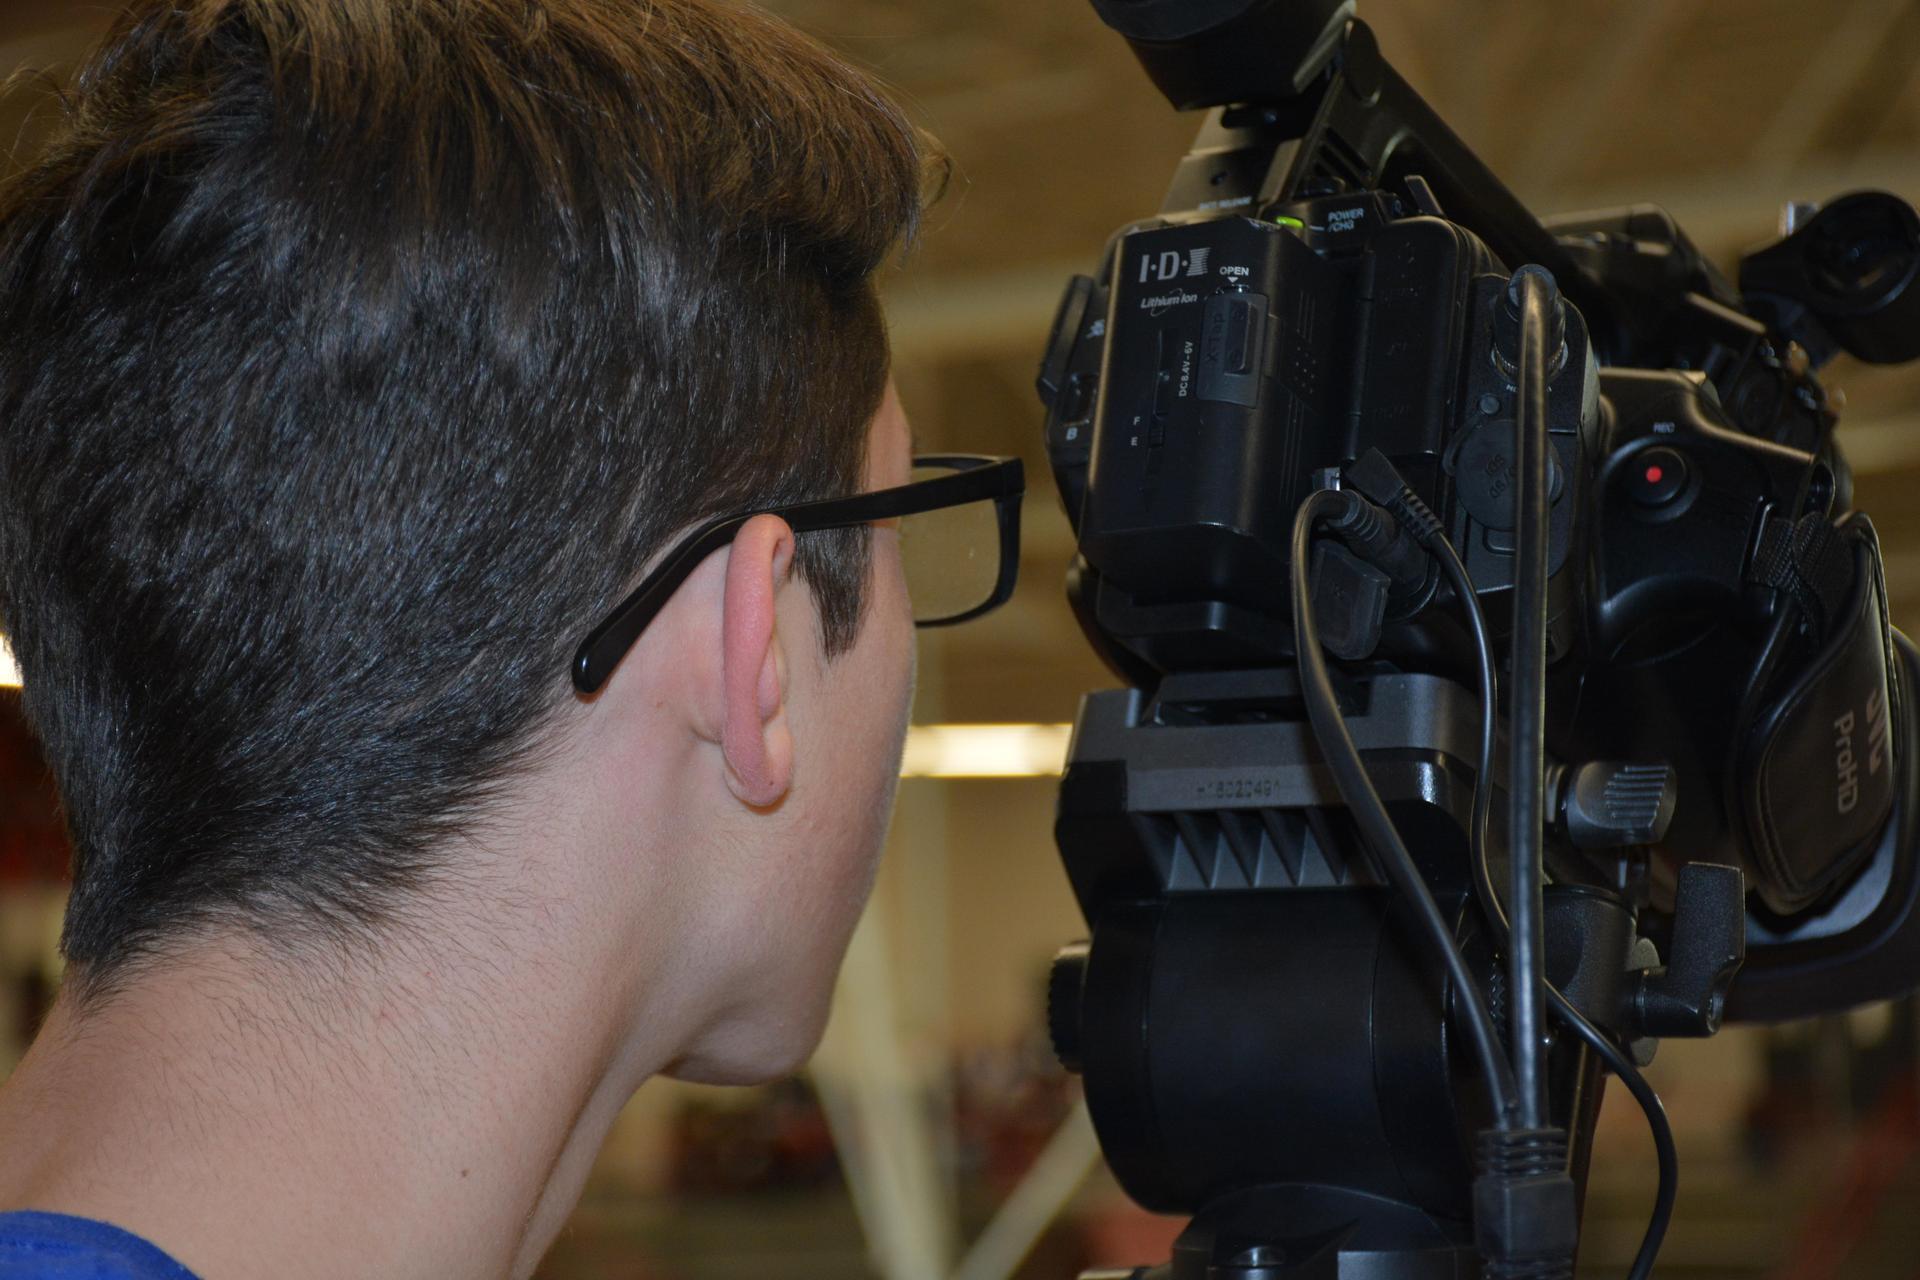 media student behind a camera